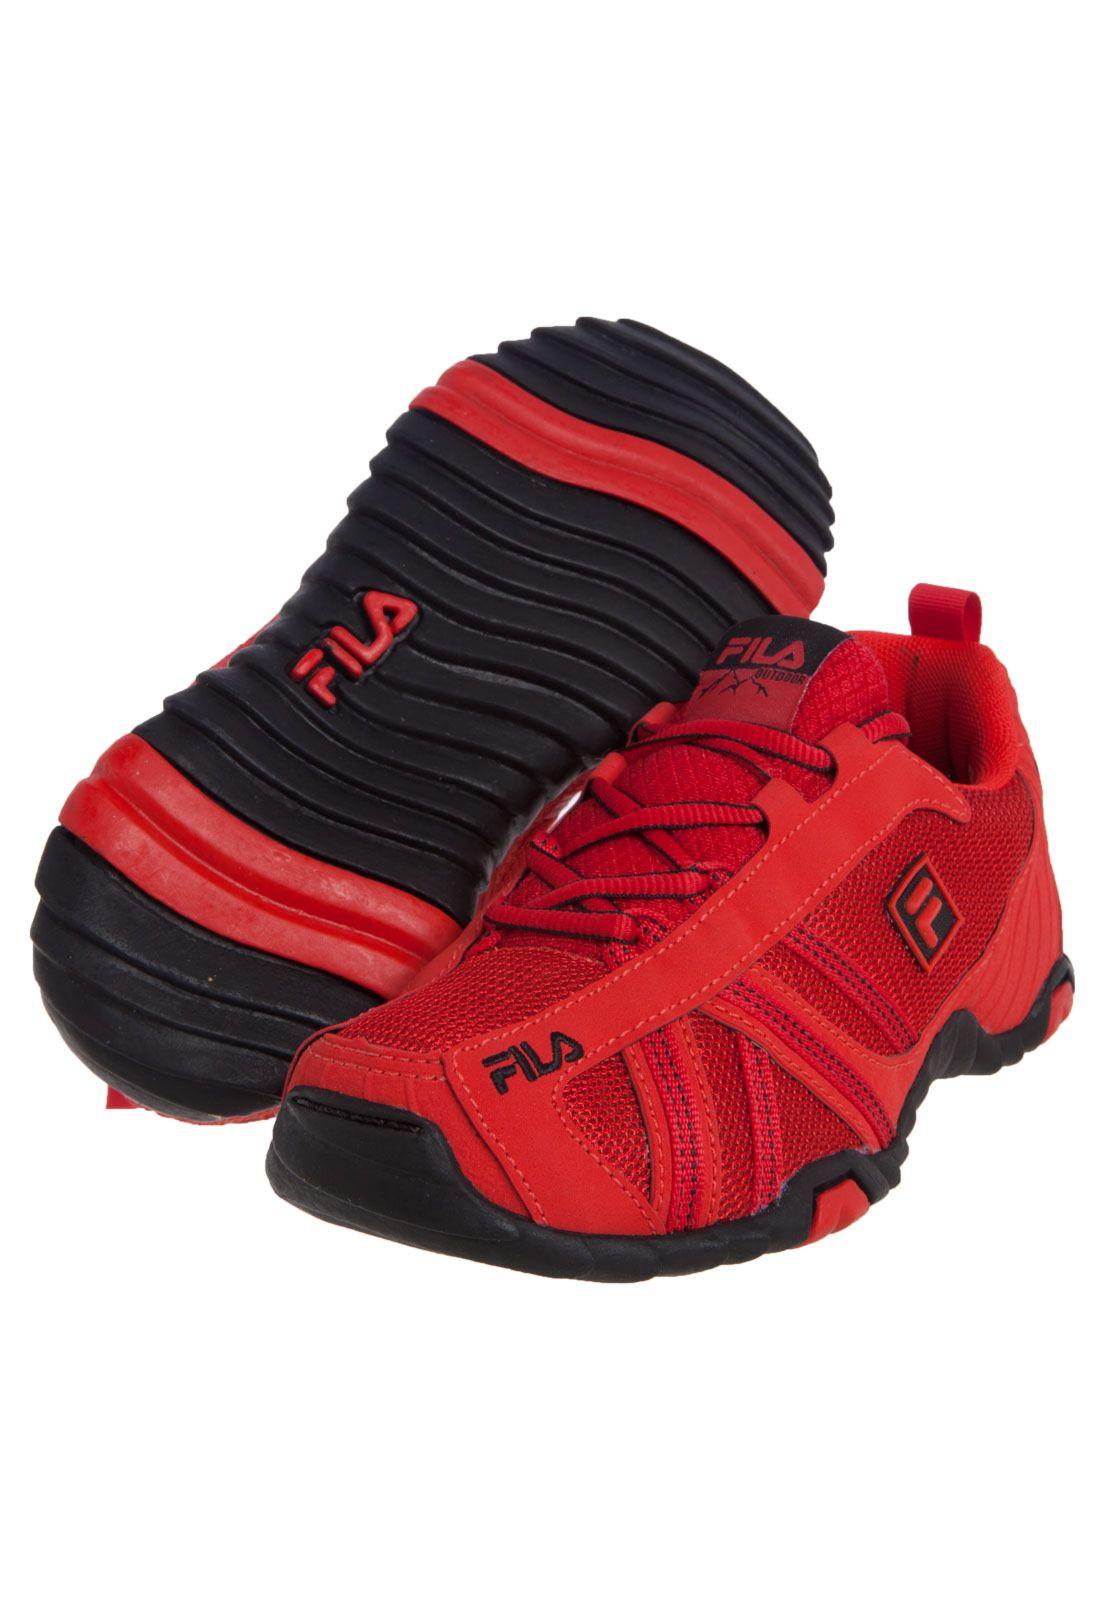 Tênis Fila Slant Sport W Vermelho - Compre Agora  2f36b1aa1776f